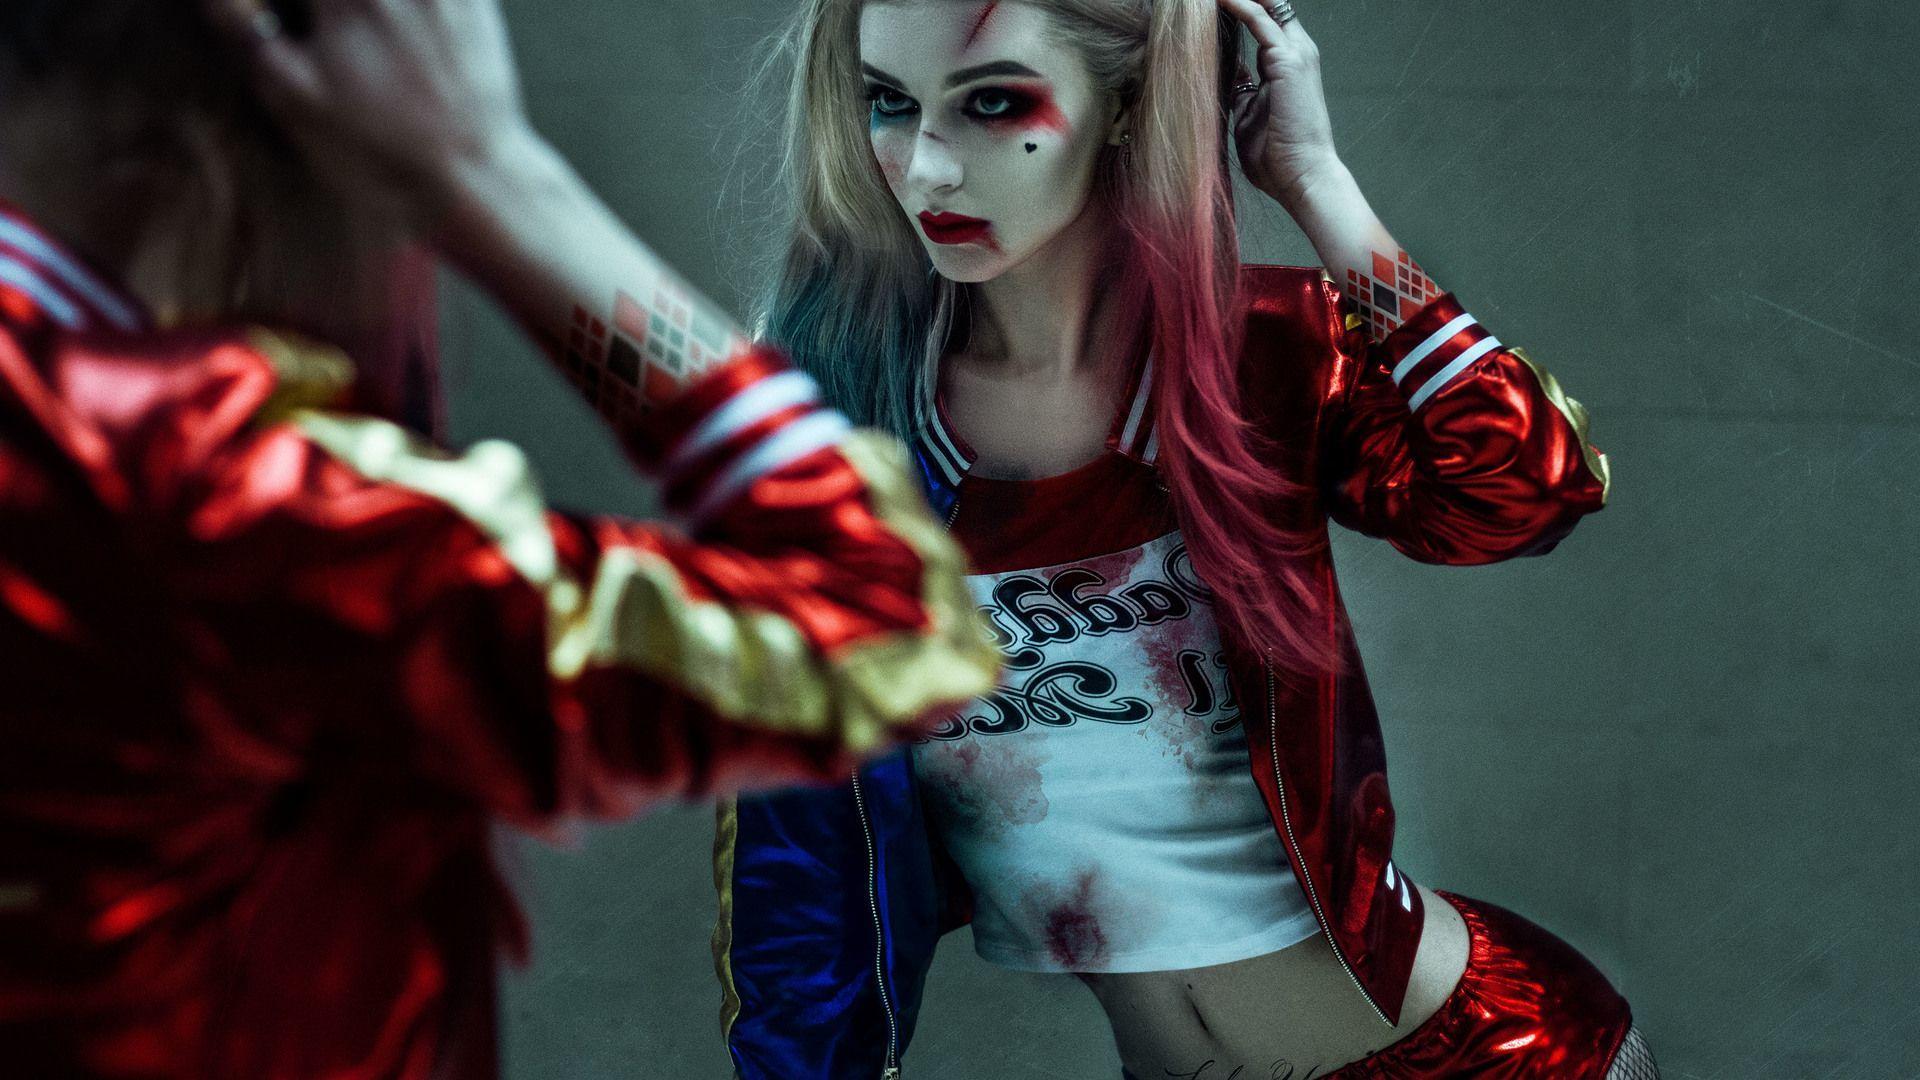 Harley Quinn Laptop Wallpapers Top Free Harley Quinn